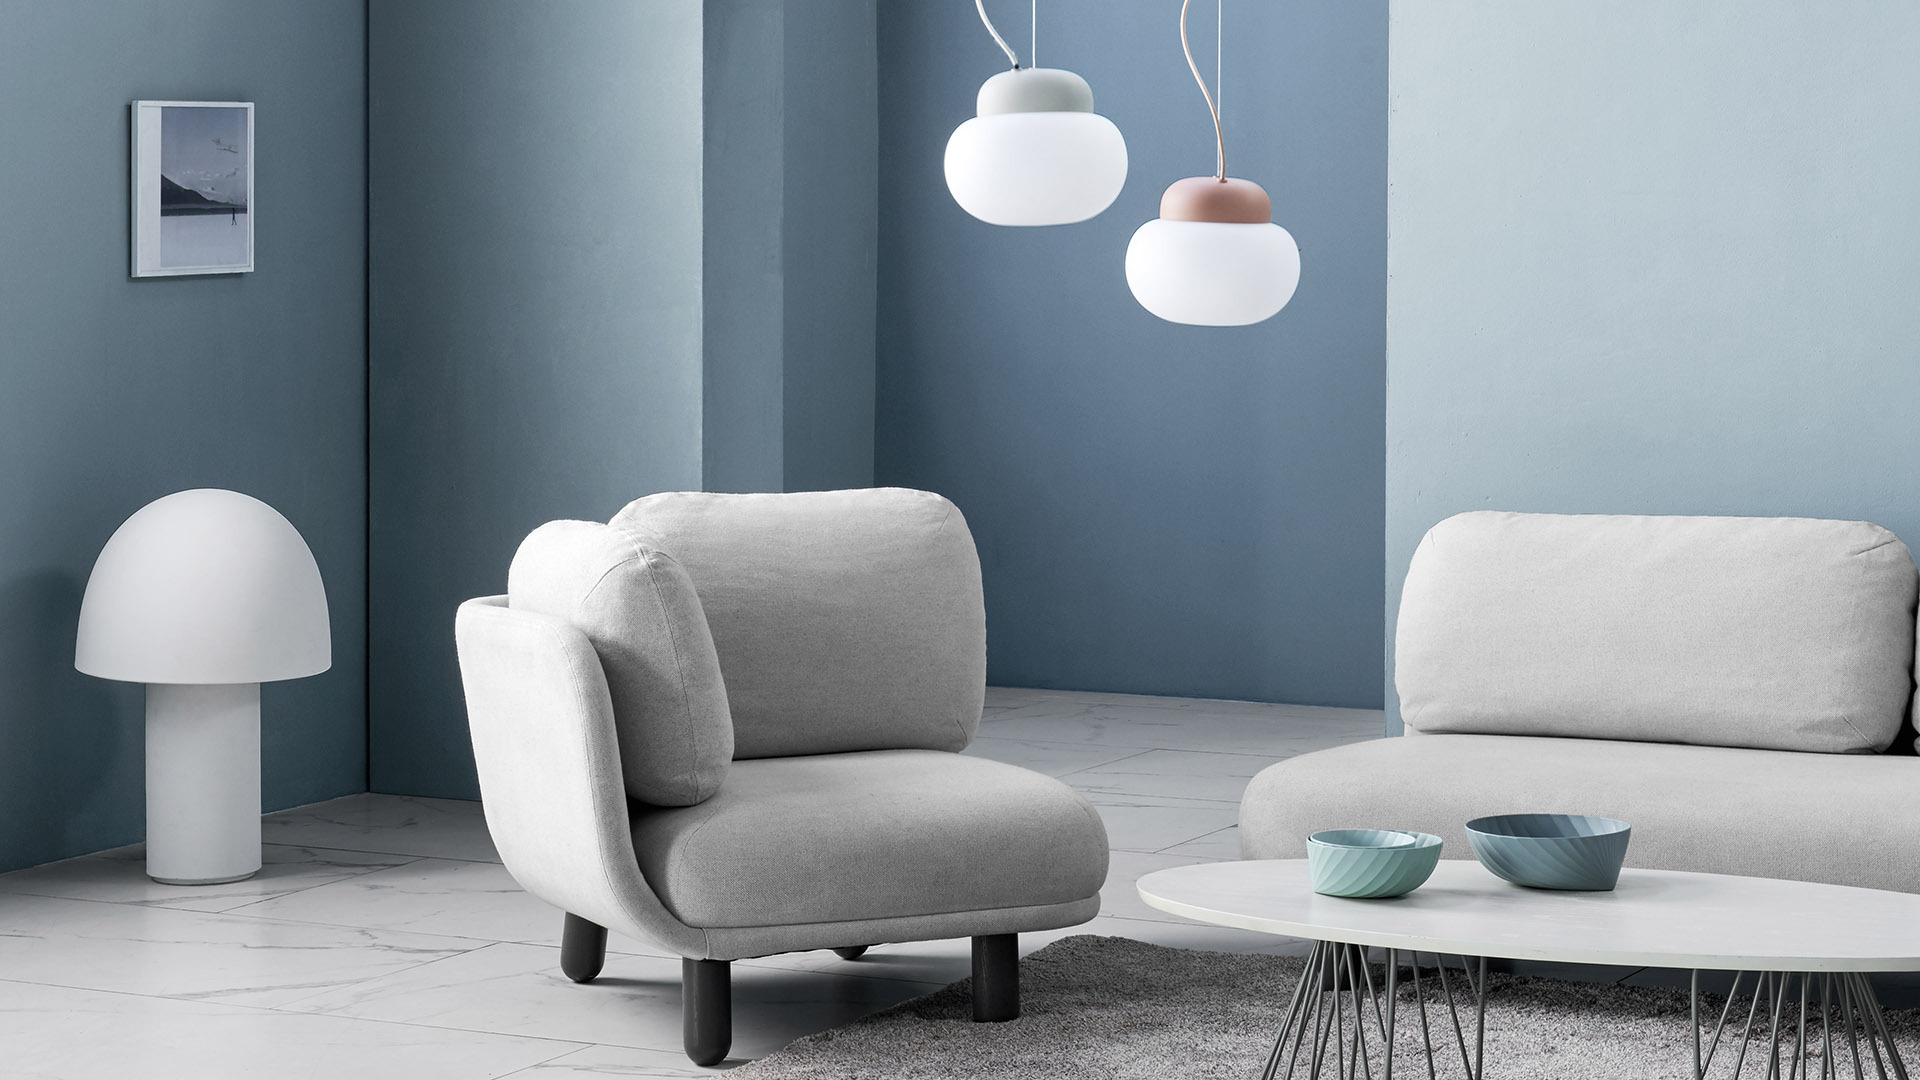 cloud-sofa_2020-1_1920x1080